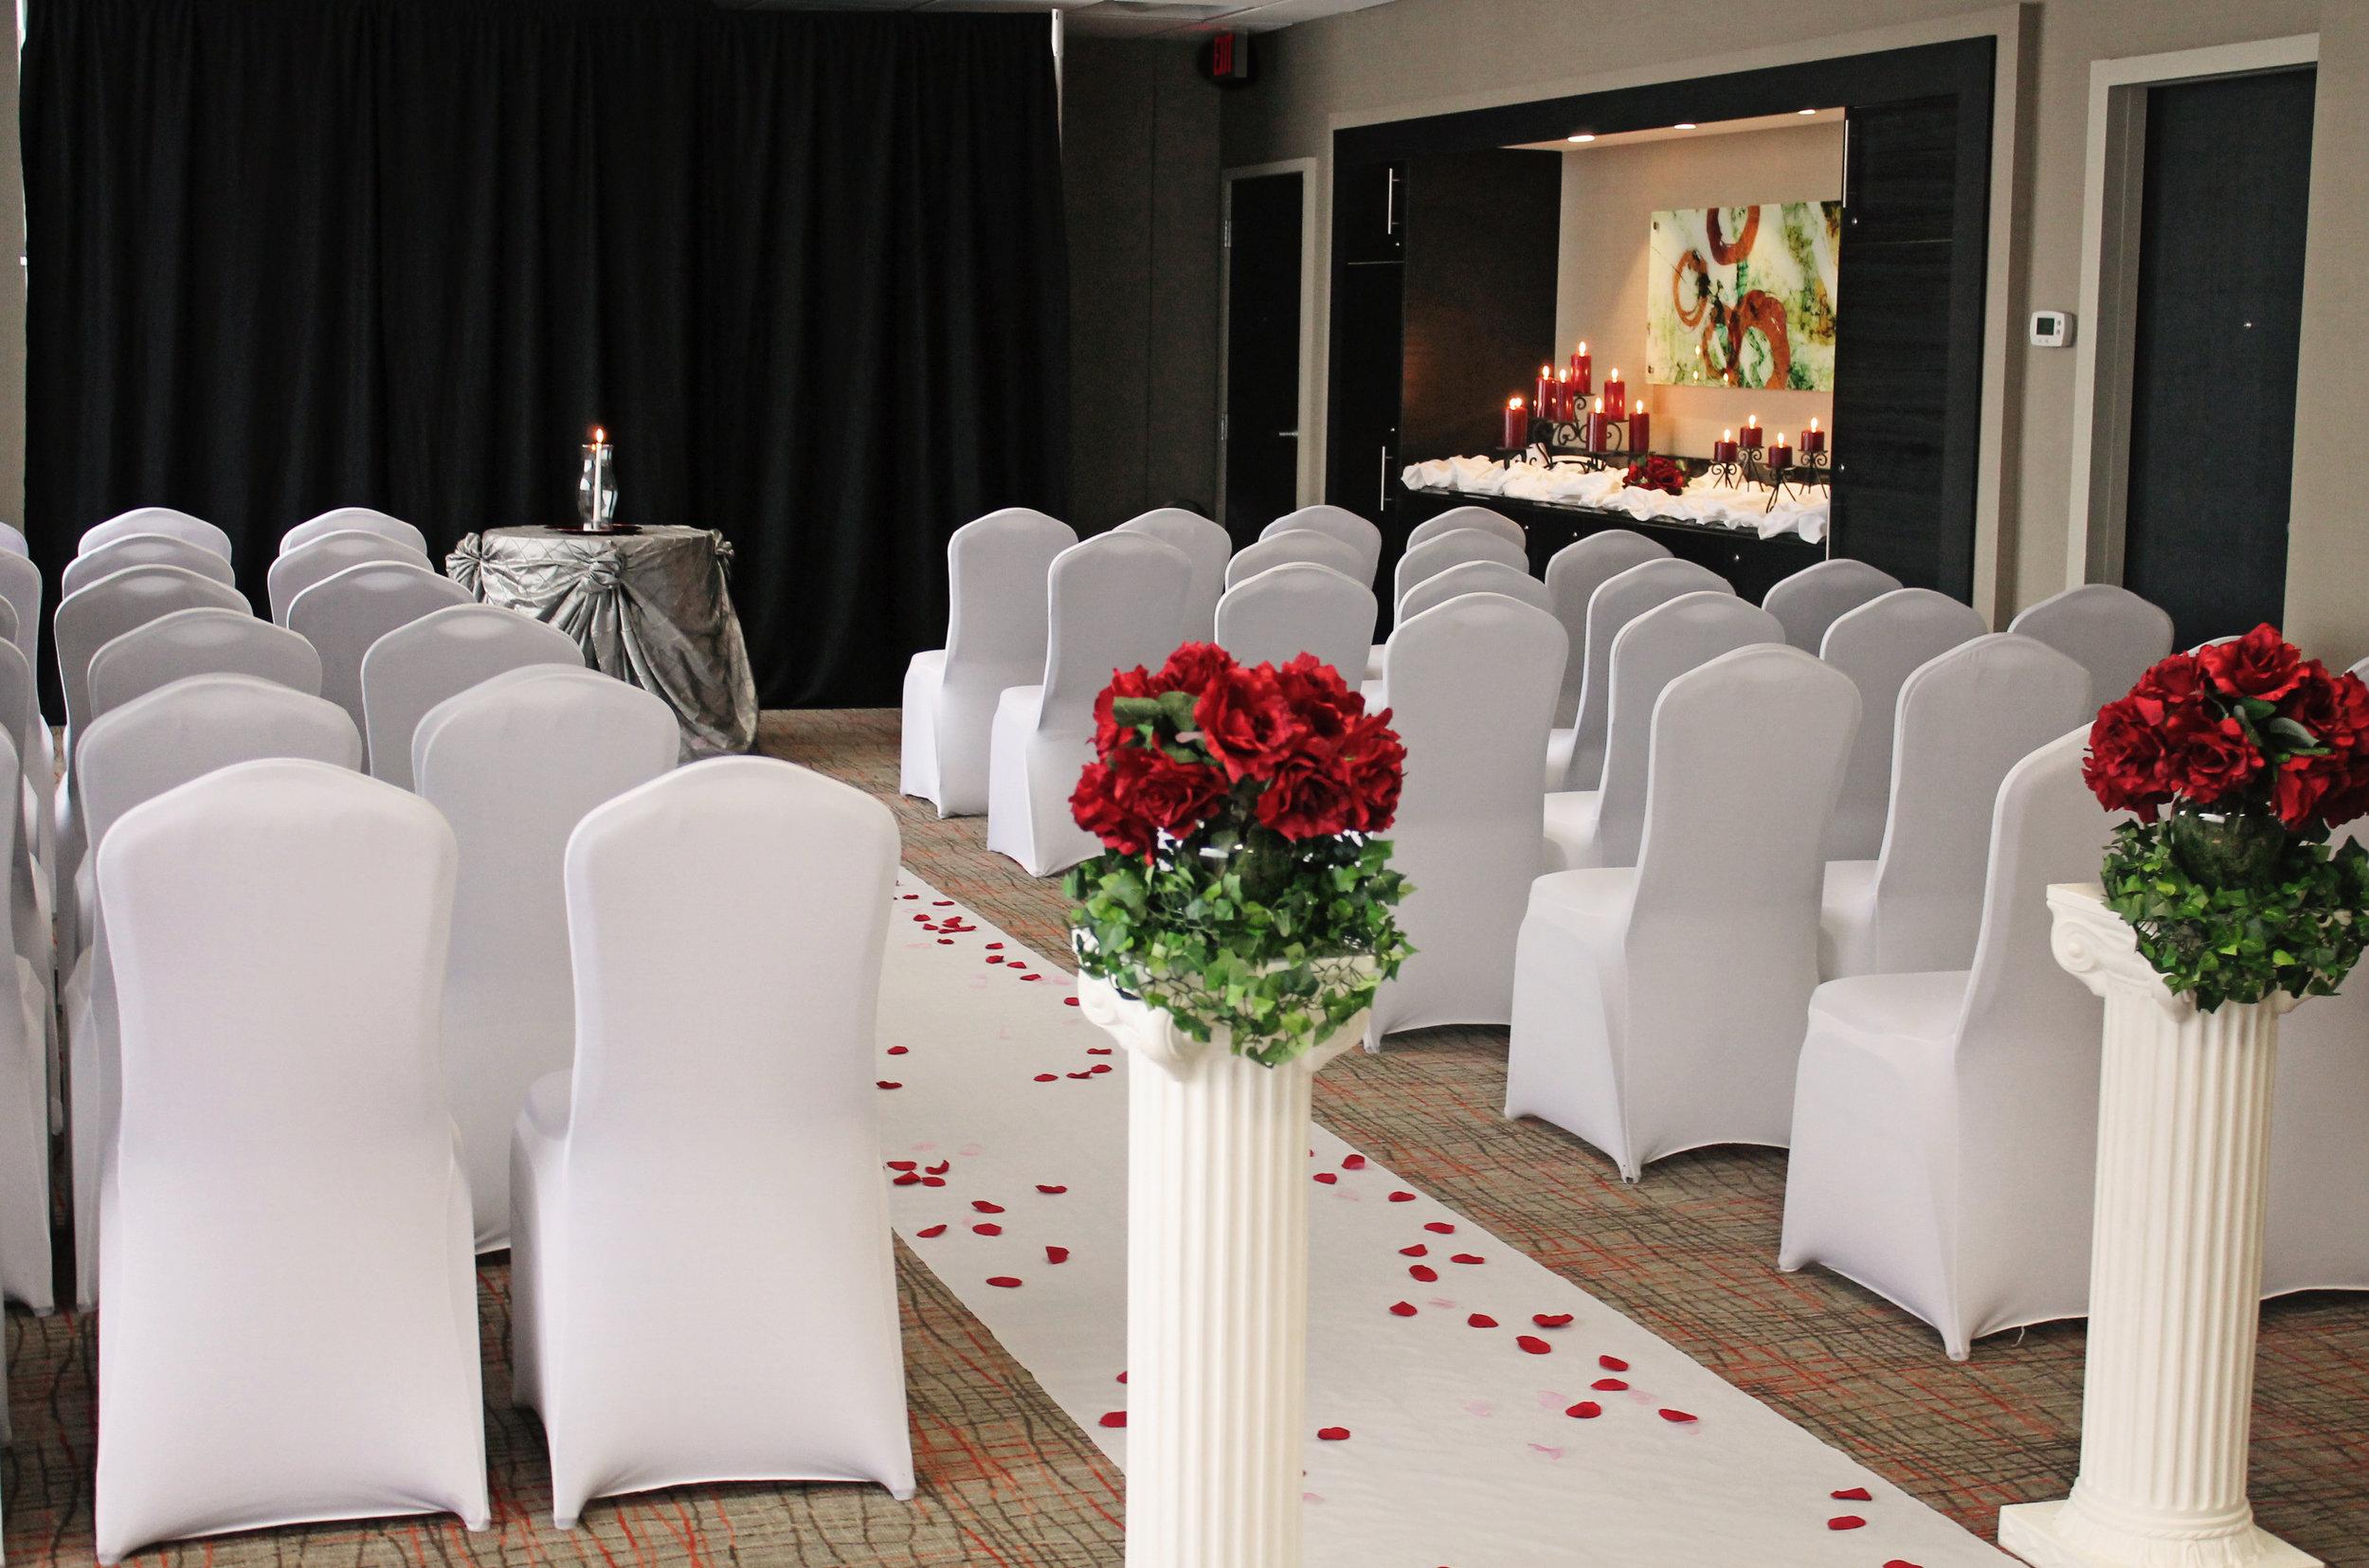 ceremonyroom4.jpg